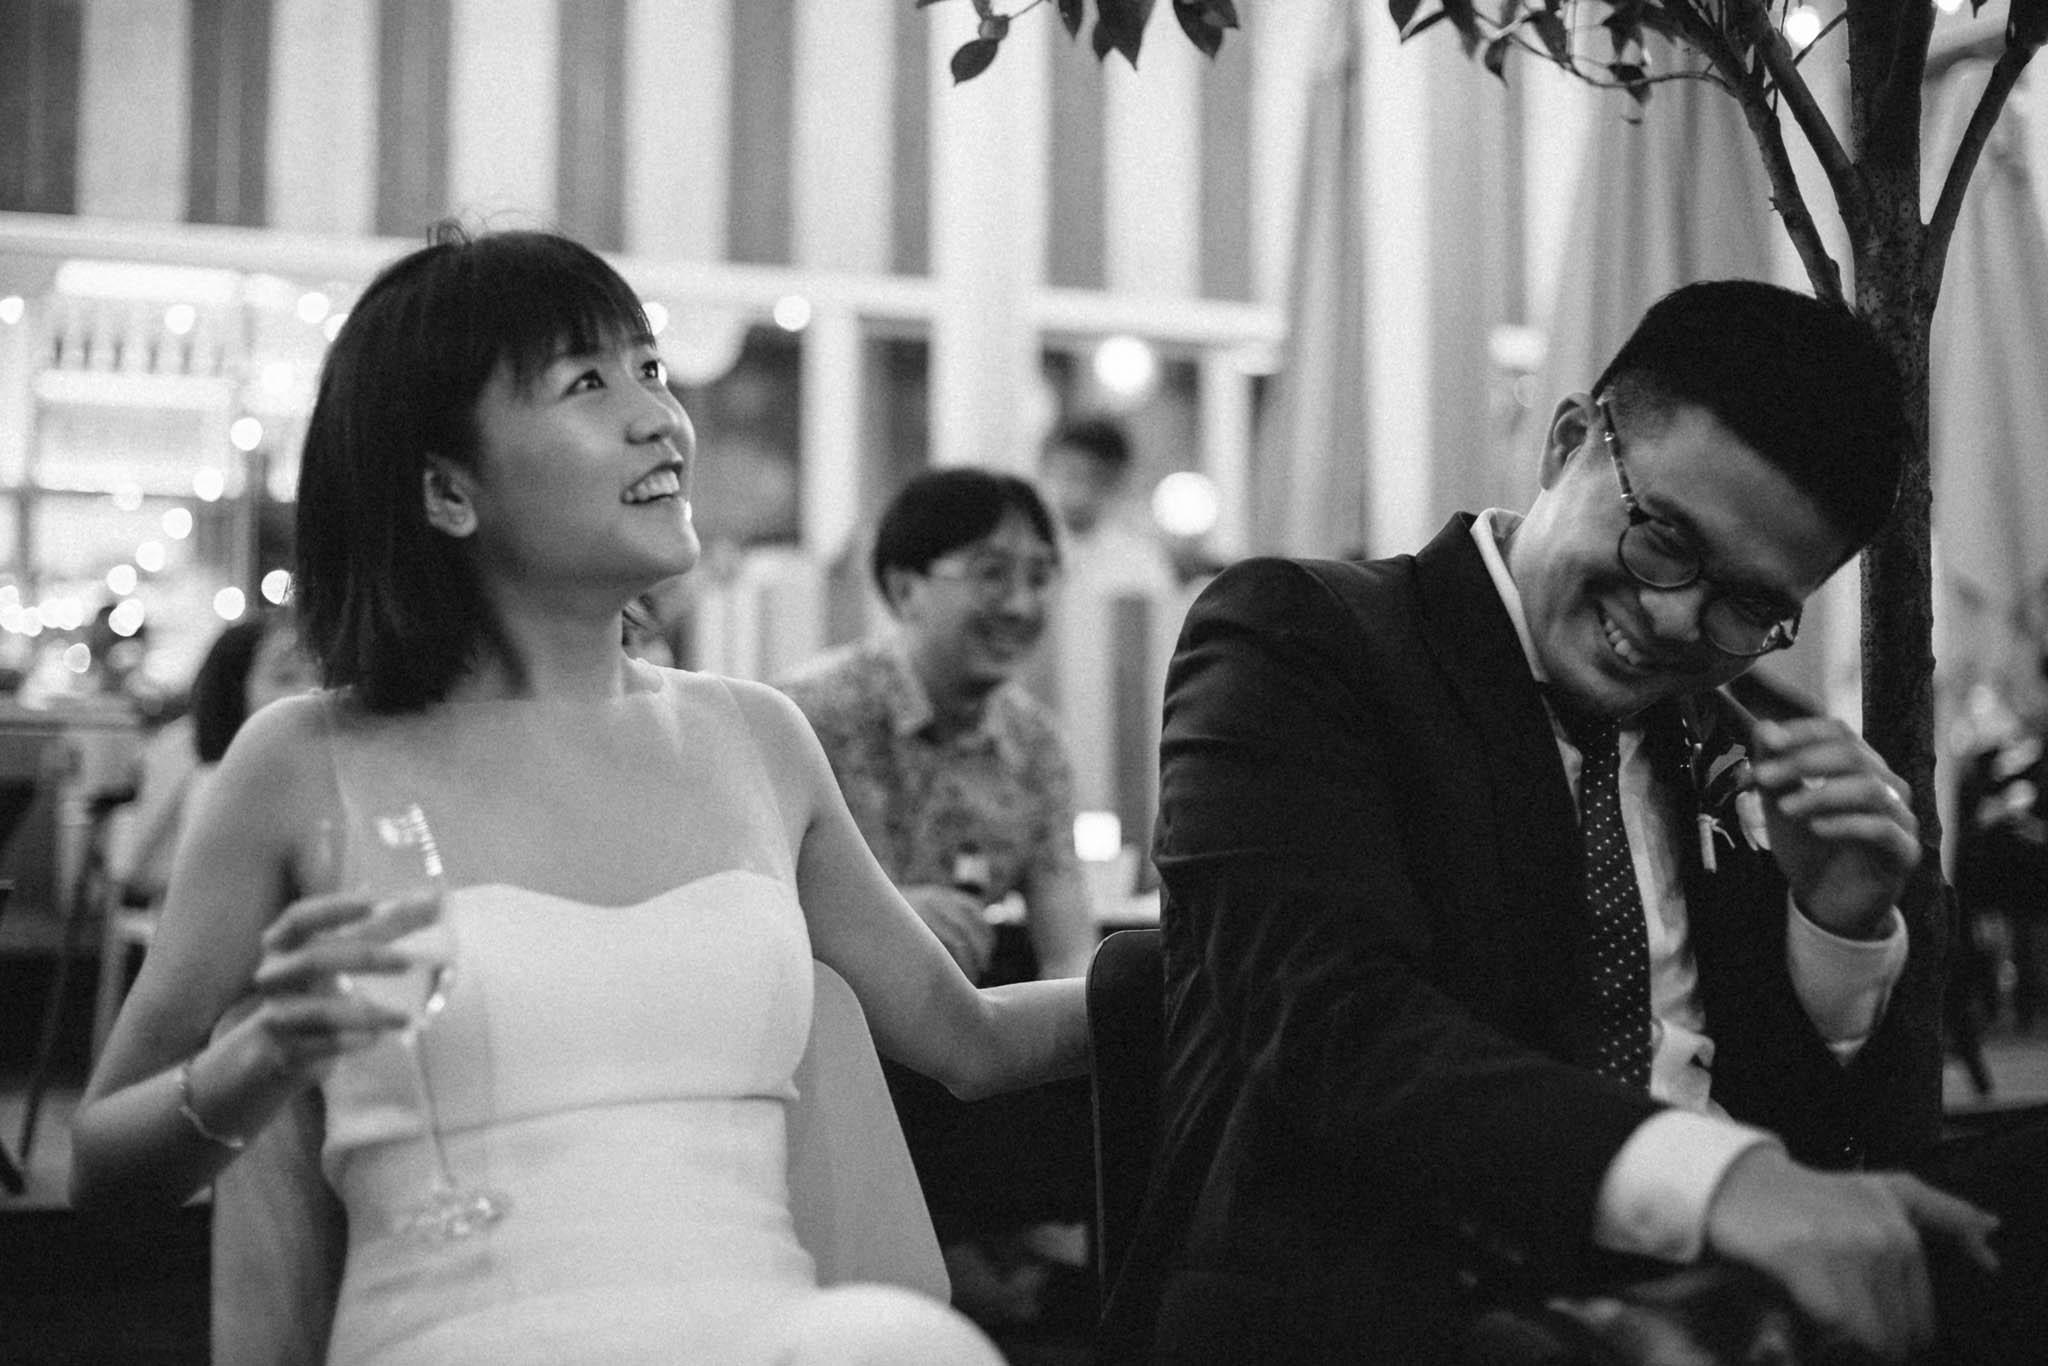 singapore-wedding-photographer-sentosa-foc-mark-eleanor-49.jpg